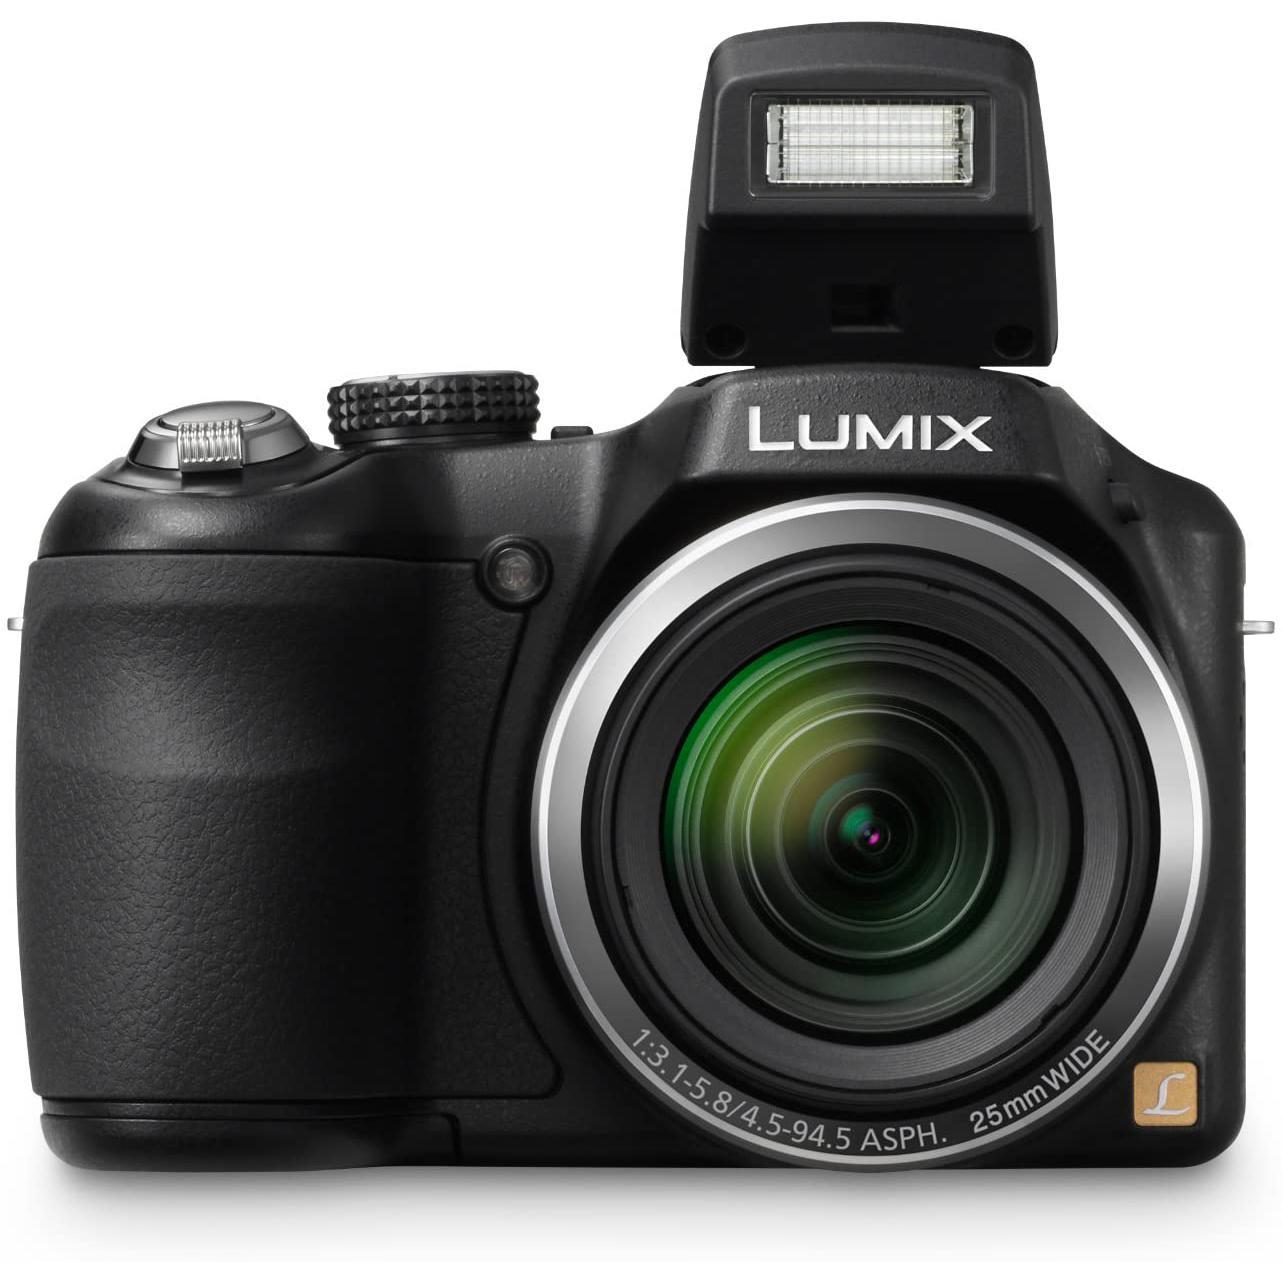 Panasonic Lumix DMC-LZ20 Bridge 16Mpx - Black